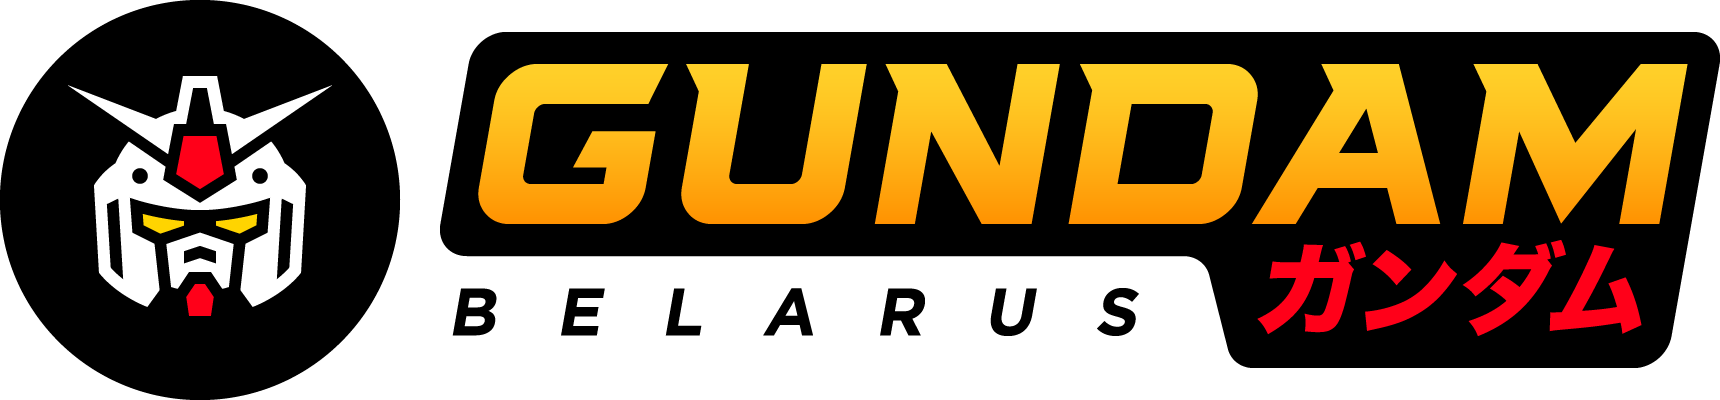 Gundam Belarus